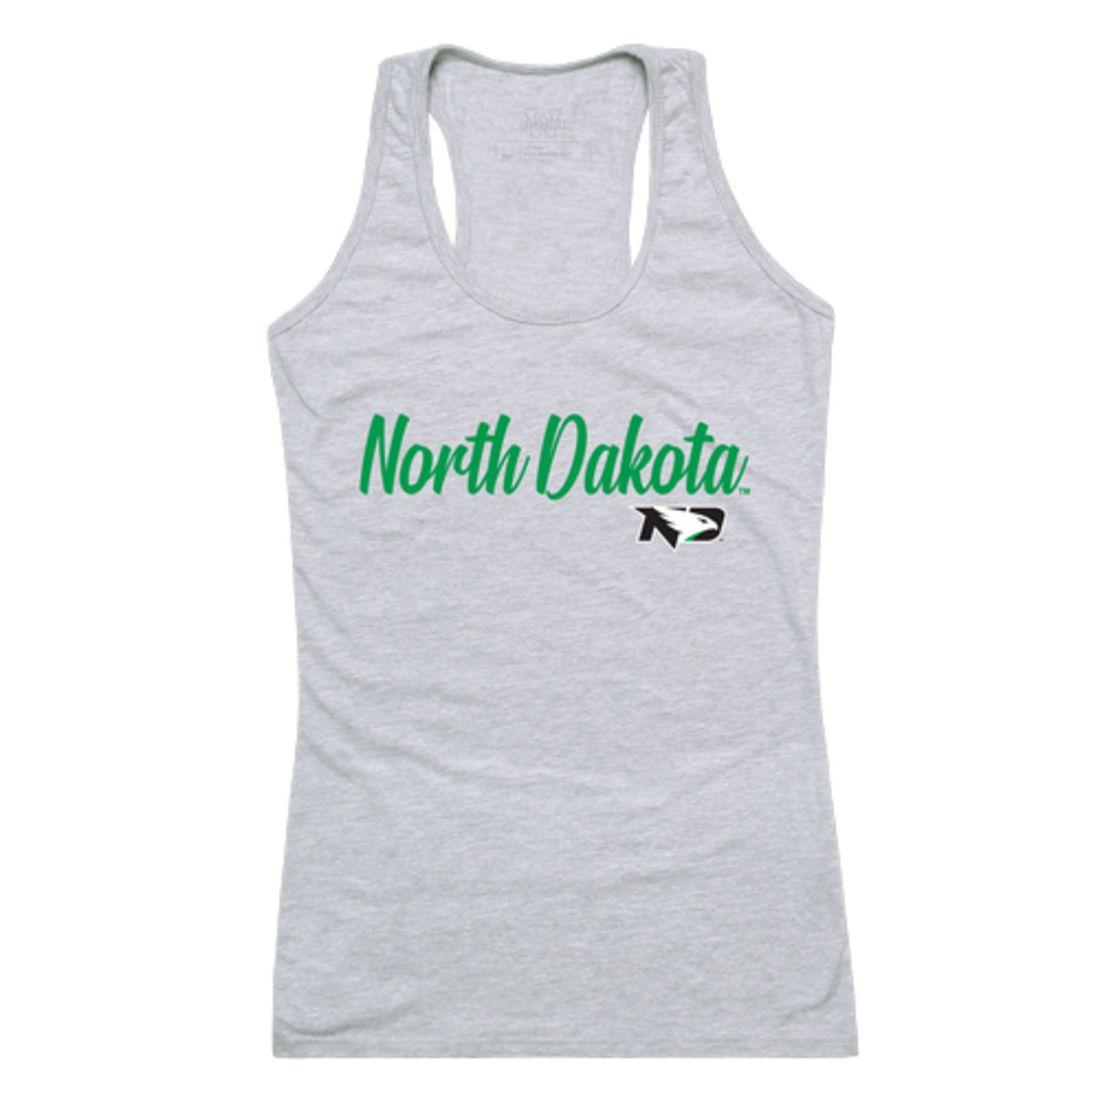 Extra Small Littlearth NCAA North Dakota Fighting Hawks Pet Dress